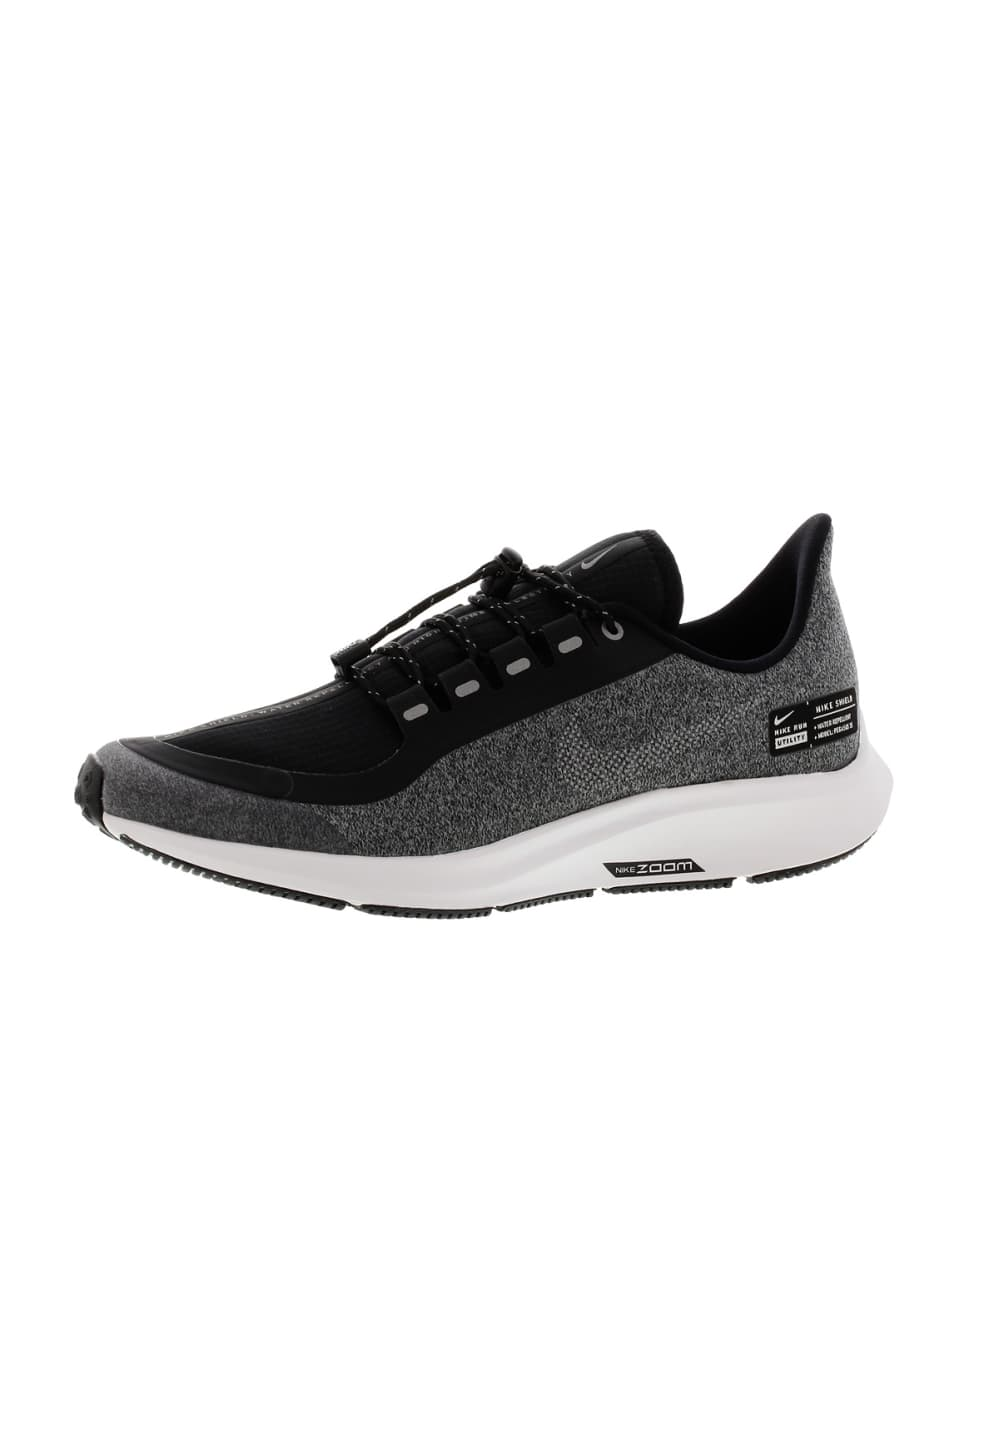 save off ea791 8fbd5 Nike Air Zoom Pegasus 35 Shield Gs - Running shoes - Black